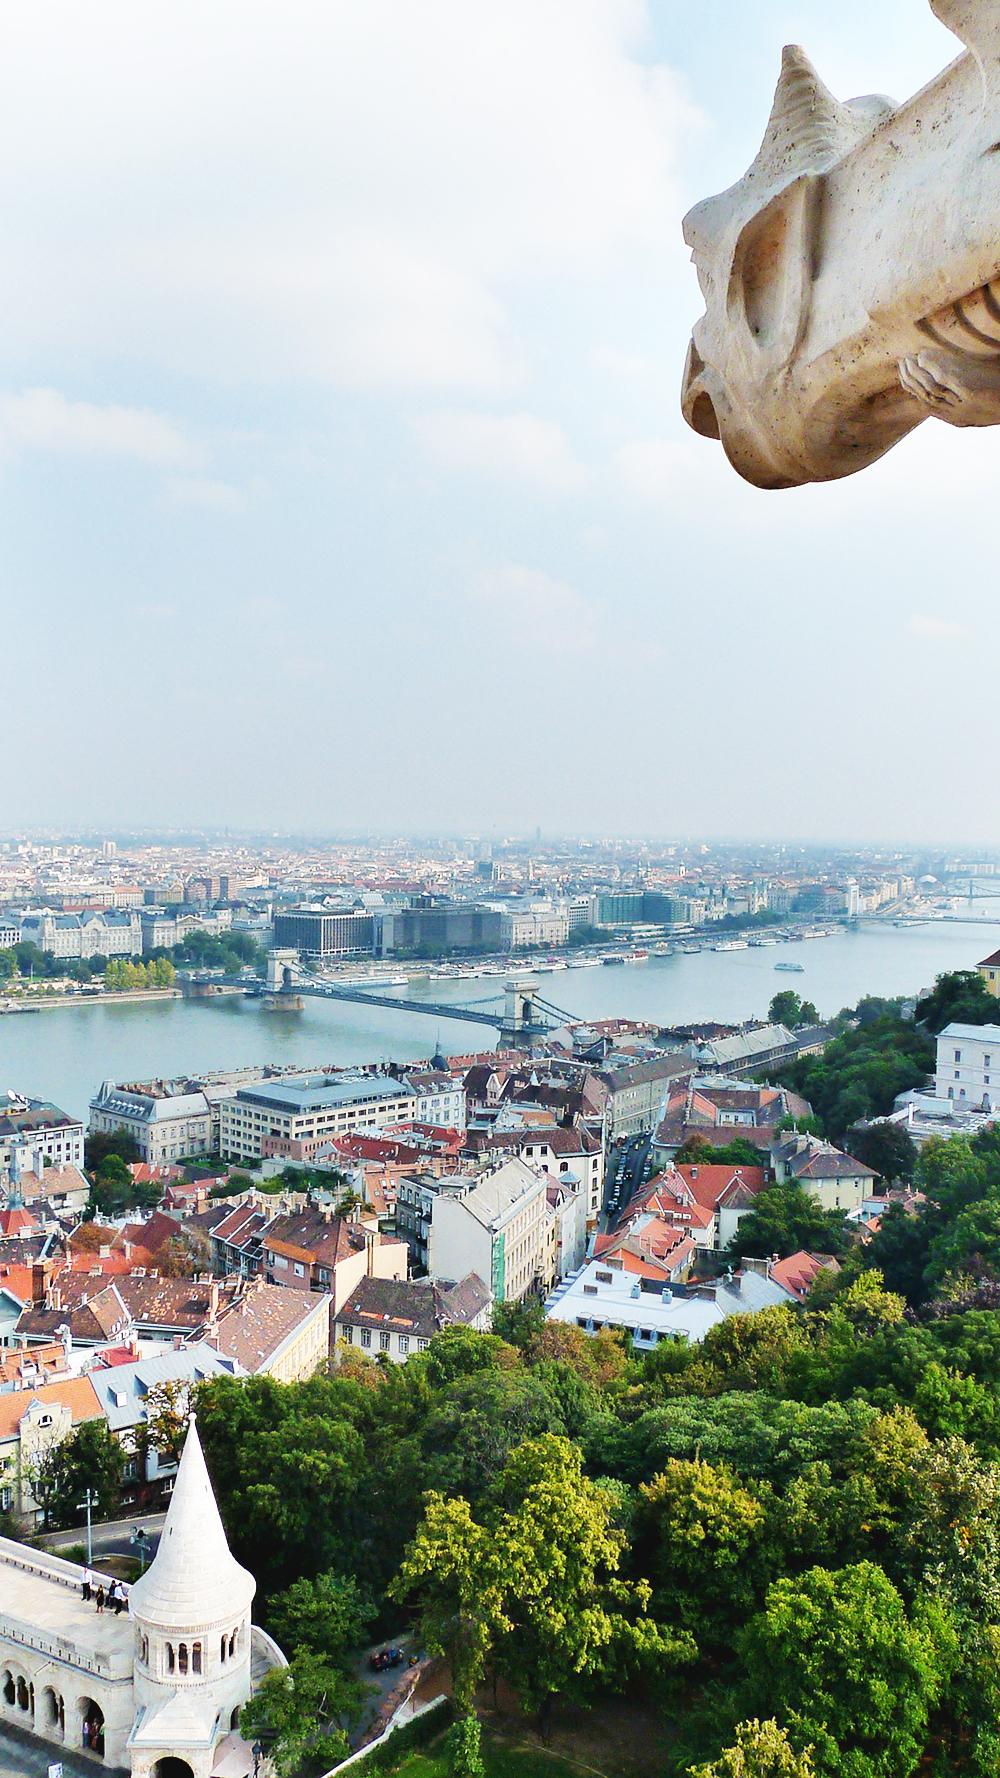 Wander around Castle District, Matthias Church - Budapest bucket list - Top things to do in Budapest   Aliz's Wonderland #travel #Budapest #bucketlist #Budapestbucketlist #printable